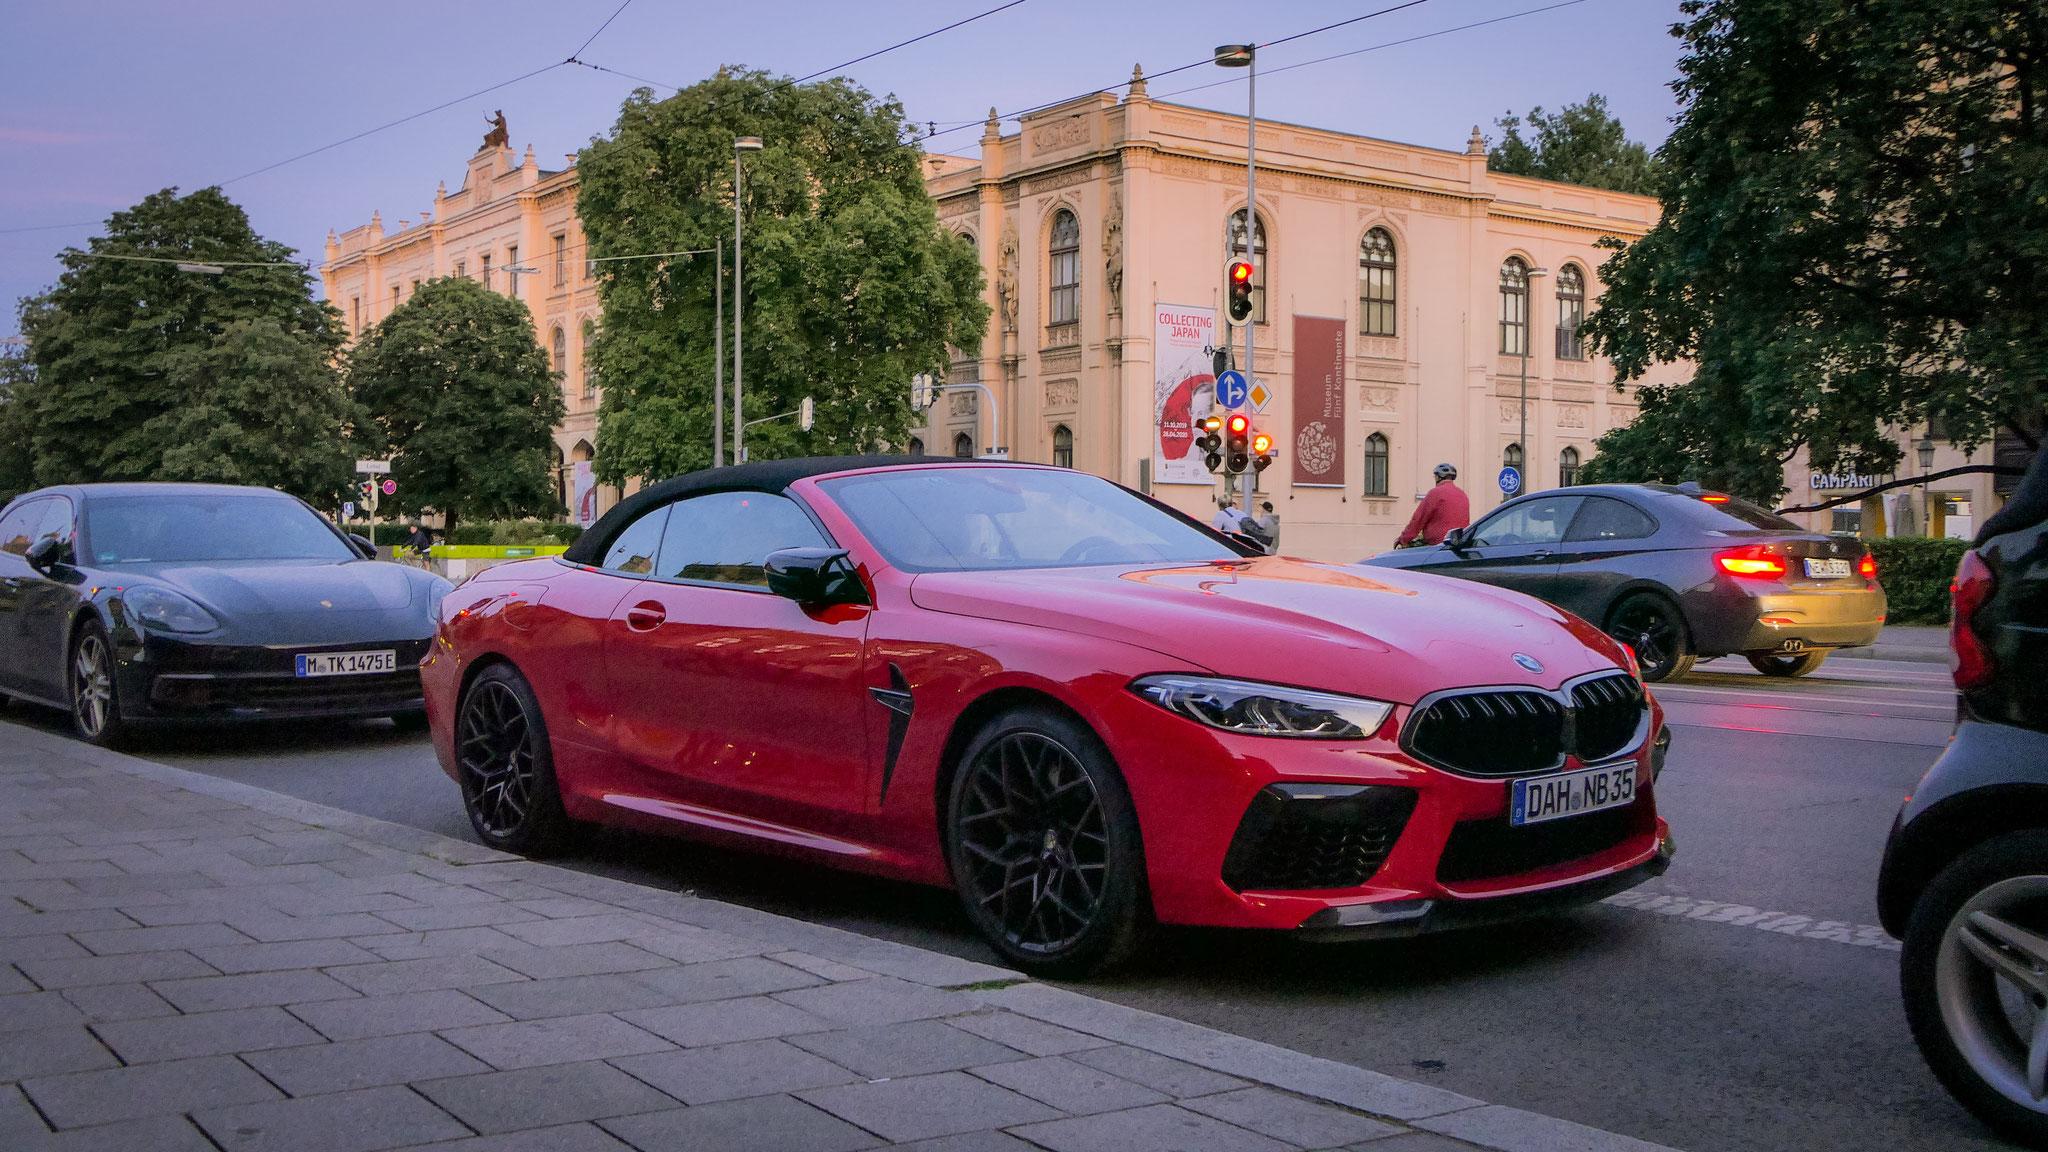 BMW M8 Competition Cabrio - DAH-NB-35